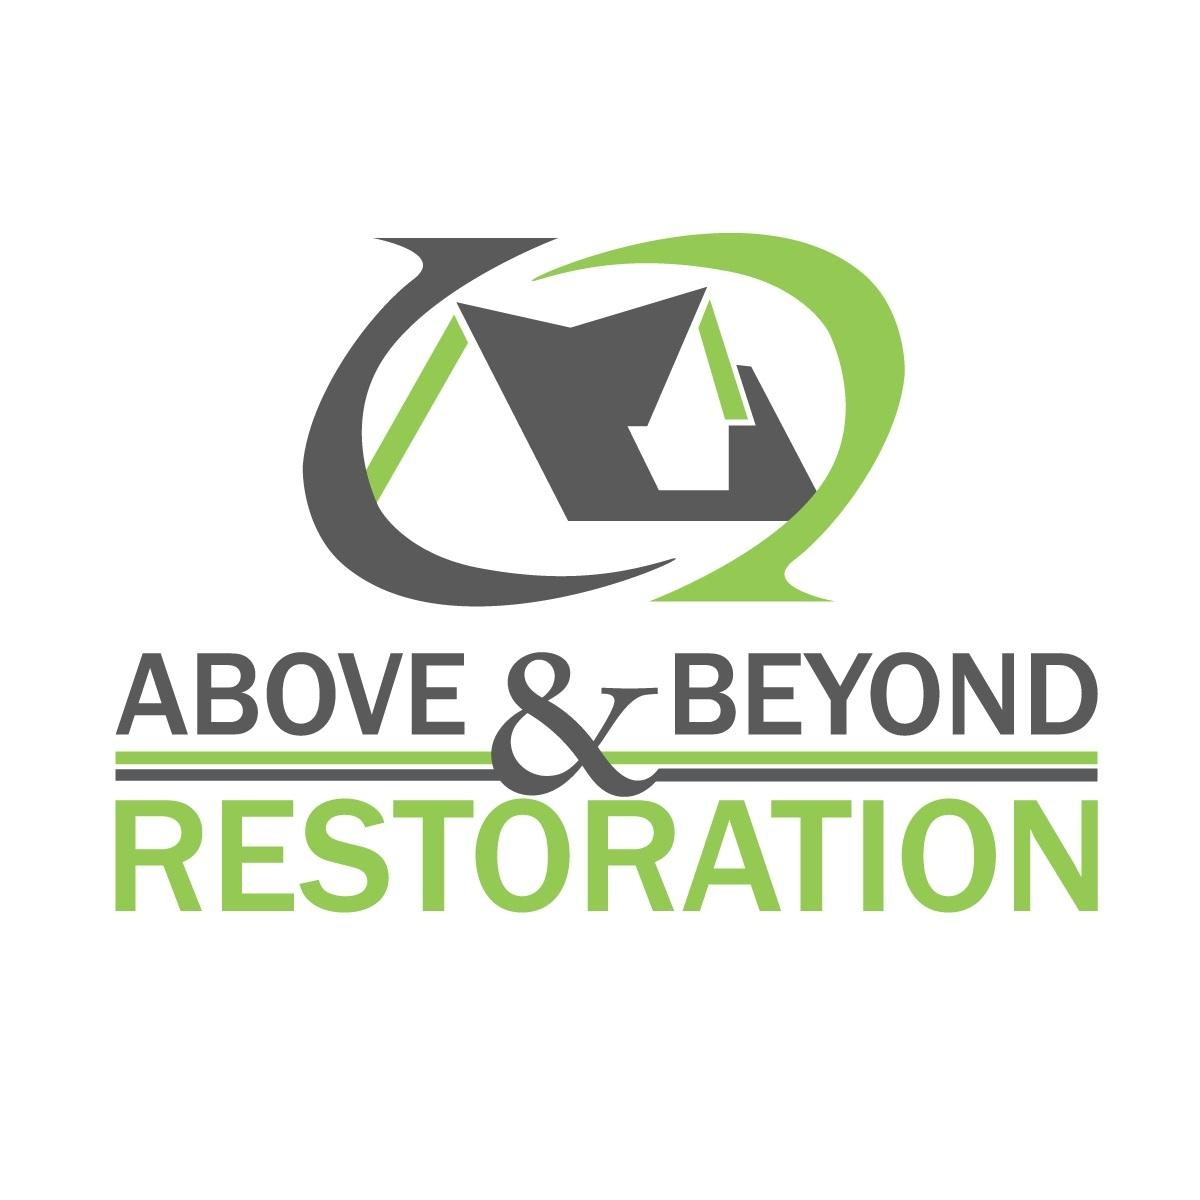 Above & Beyond Restoration LLC